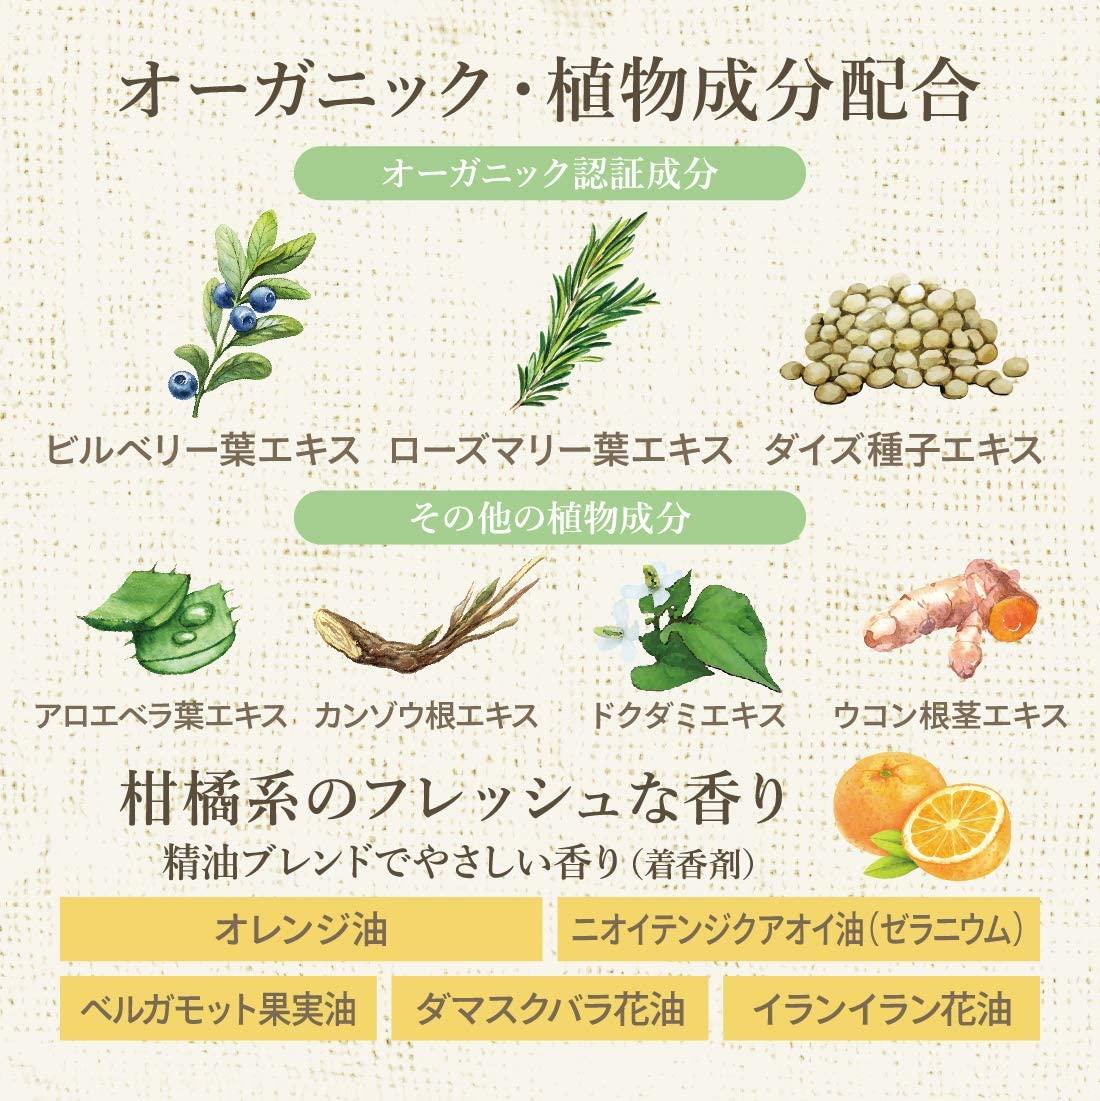 naturactor(ナチュラクター)フレッシュローション(ふきとり化粧水)の商品画像6